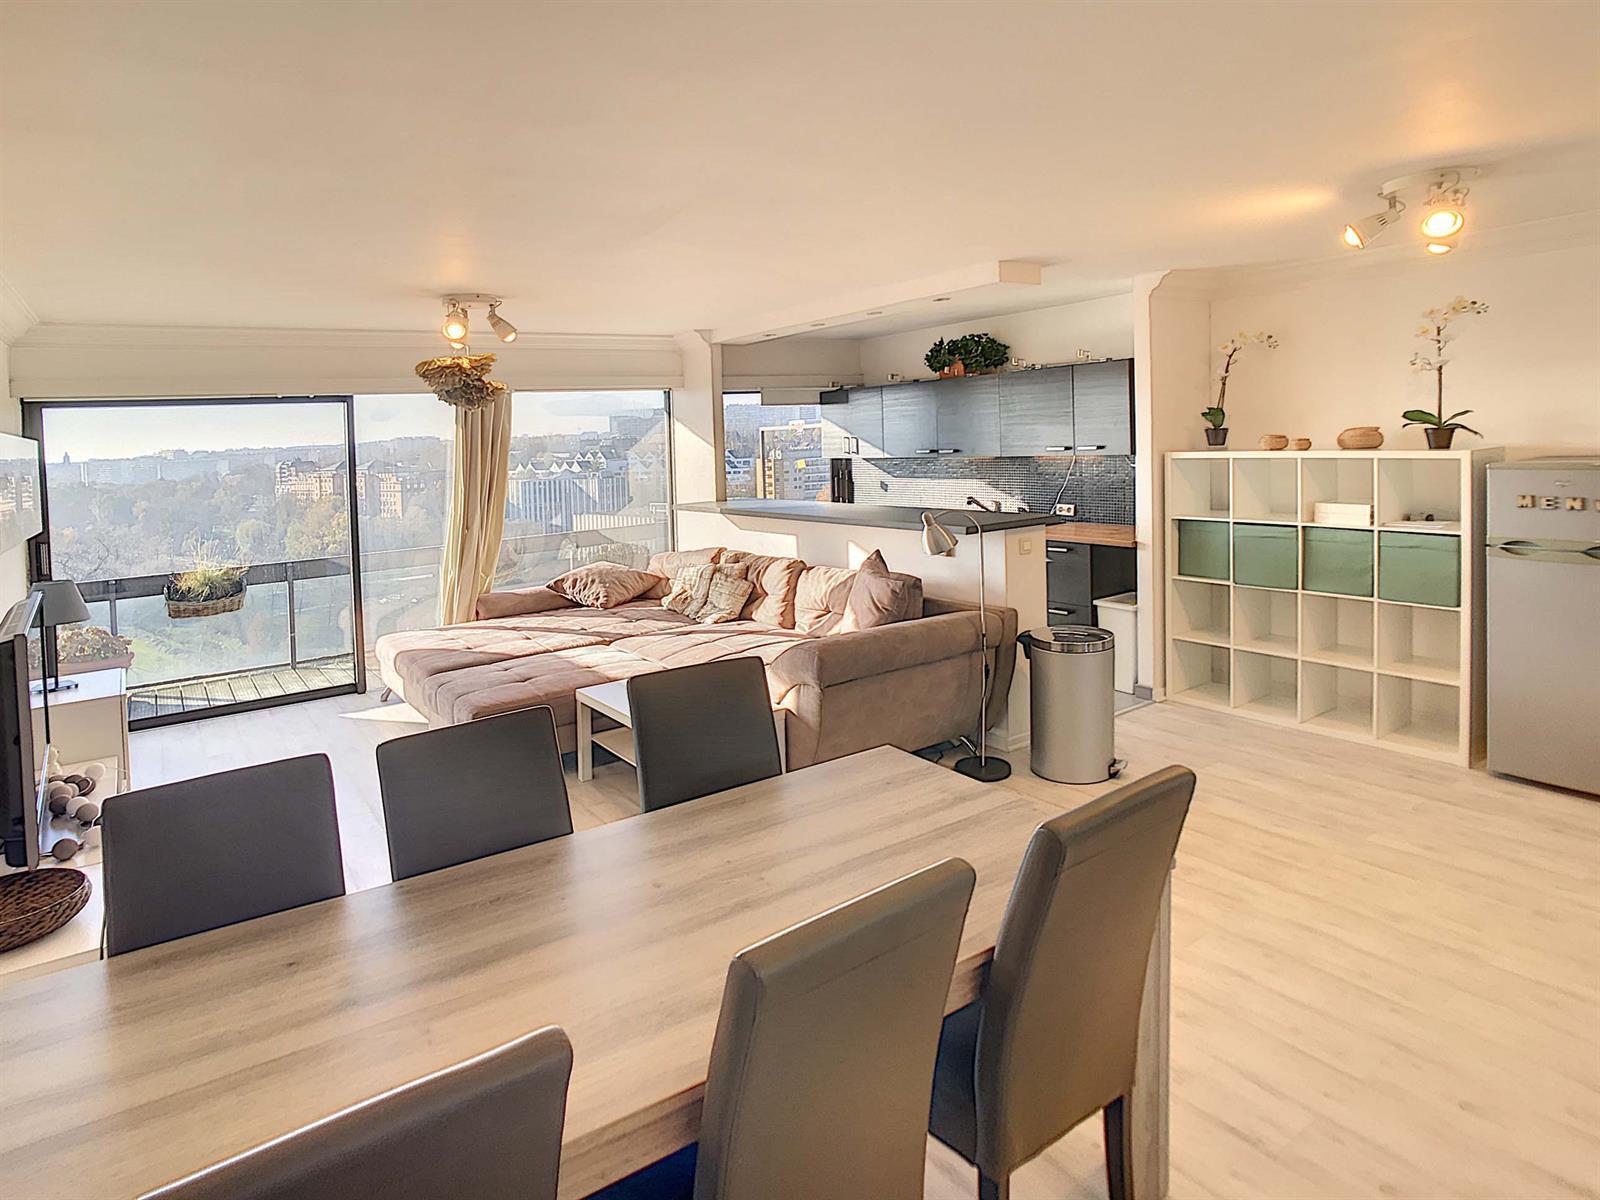 Appartement - Zaventem Sint-Stevens-Woluwe - #4218075-4